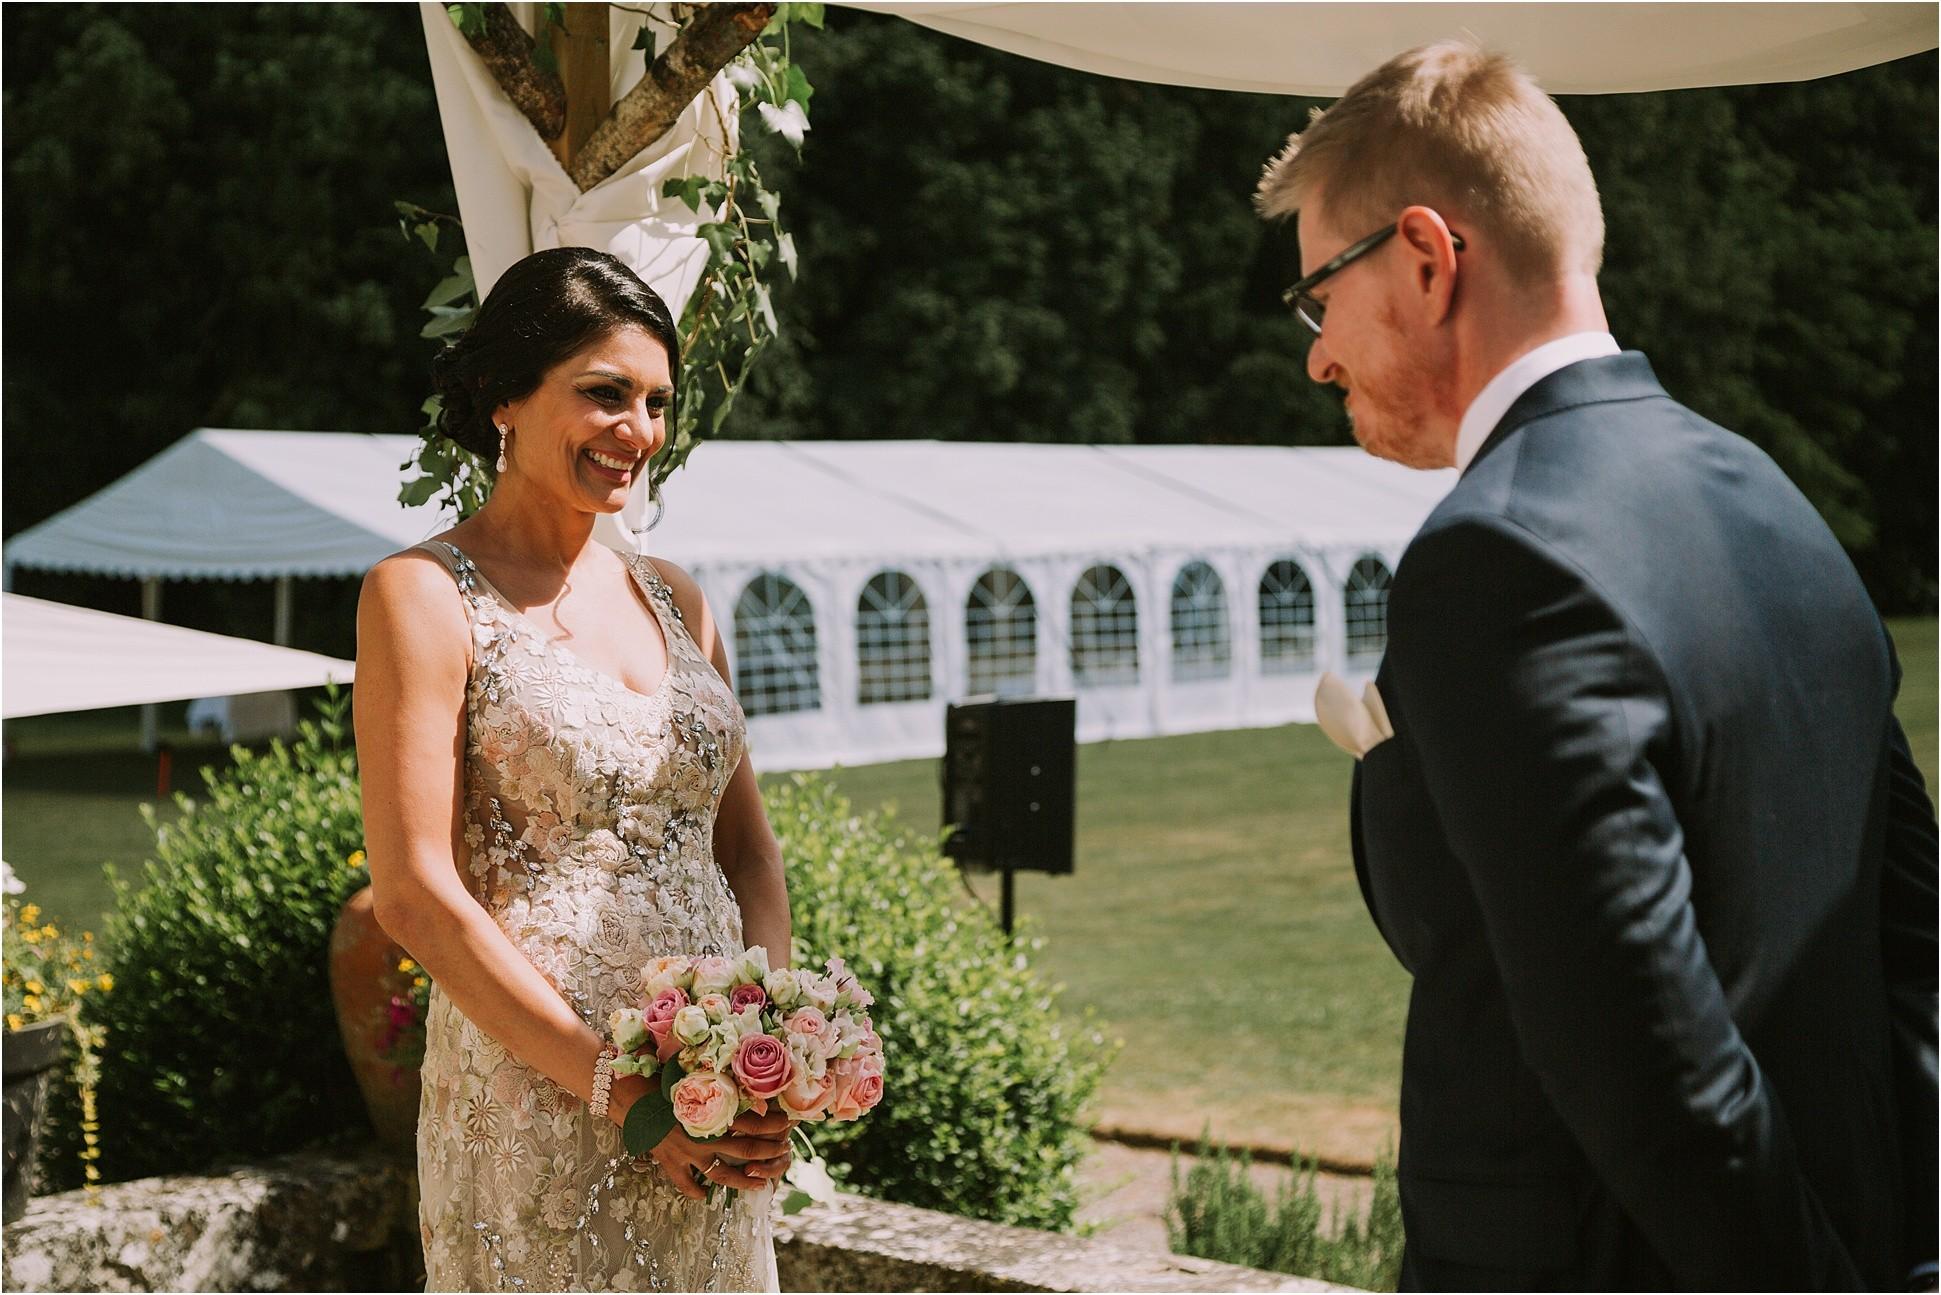 Kateryna-photos-photographe-mariage-chateau-st-paterne-mayenne-normandie_0115.jpg